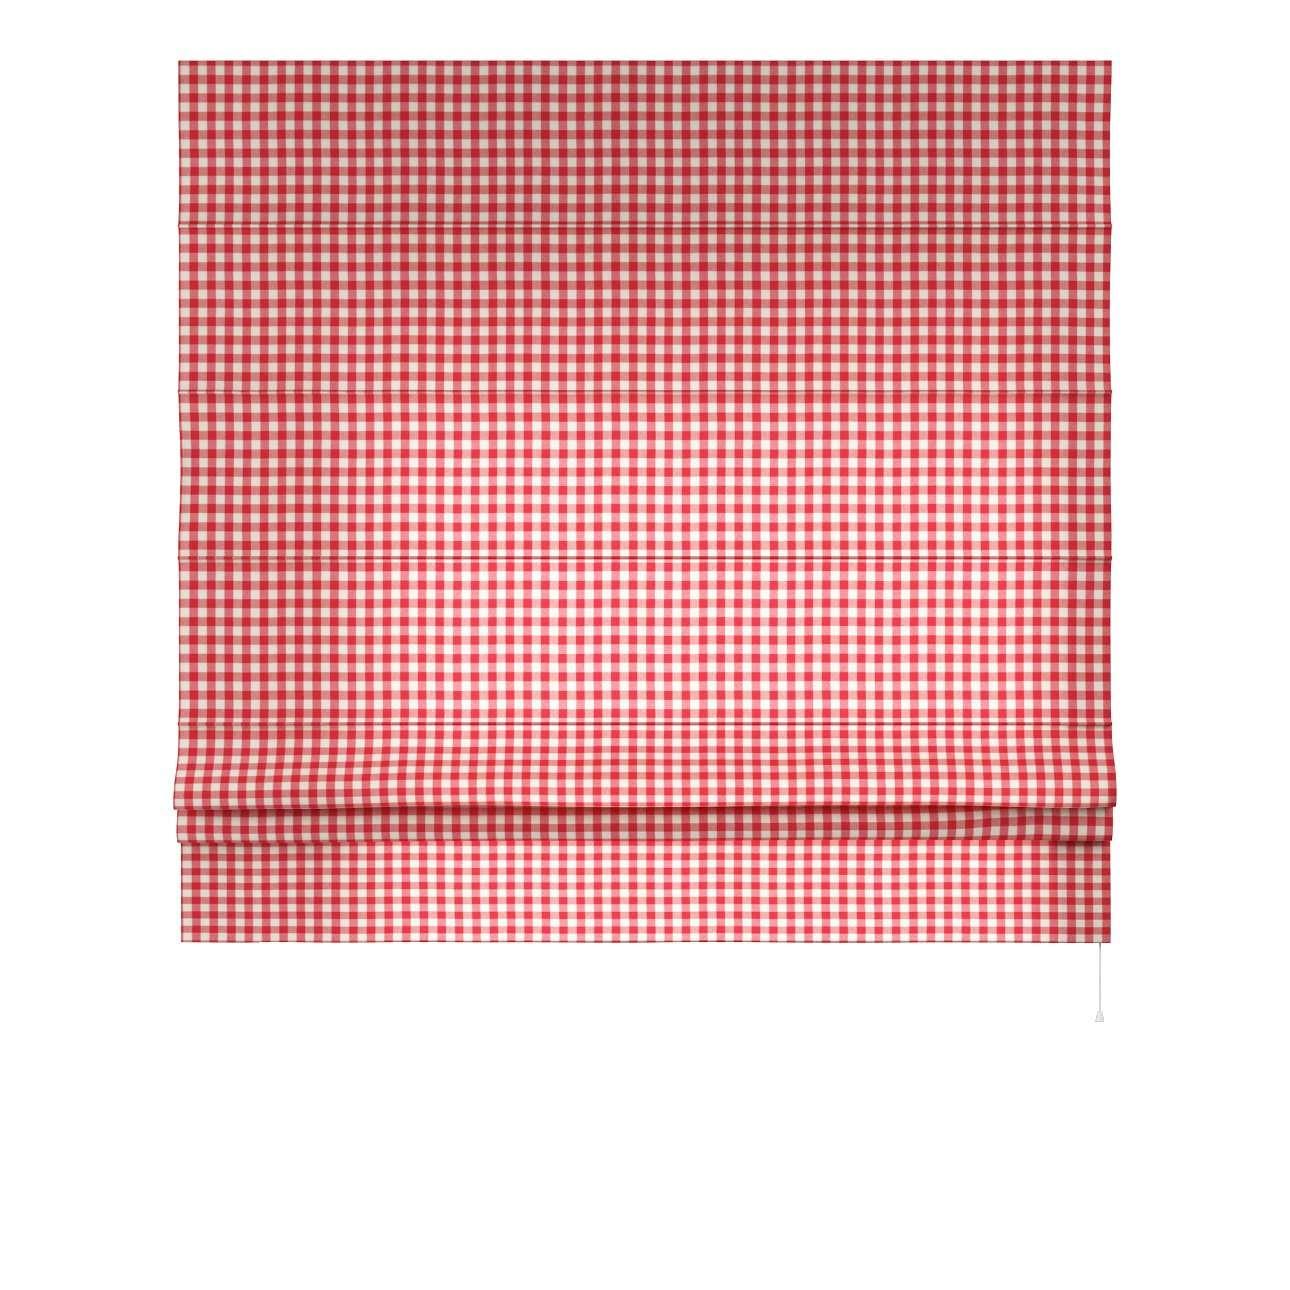 vouwgordijn Padva 80 x 170 cm van de collectie Quadro, Stof: 136-16